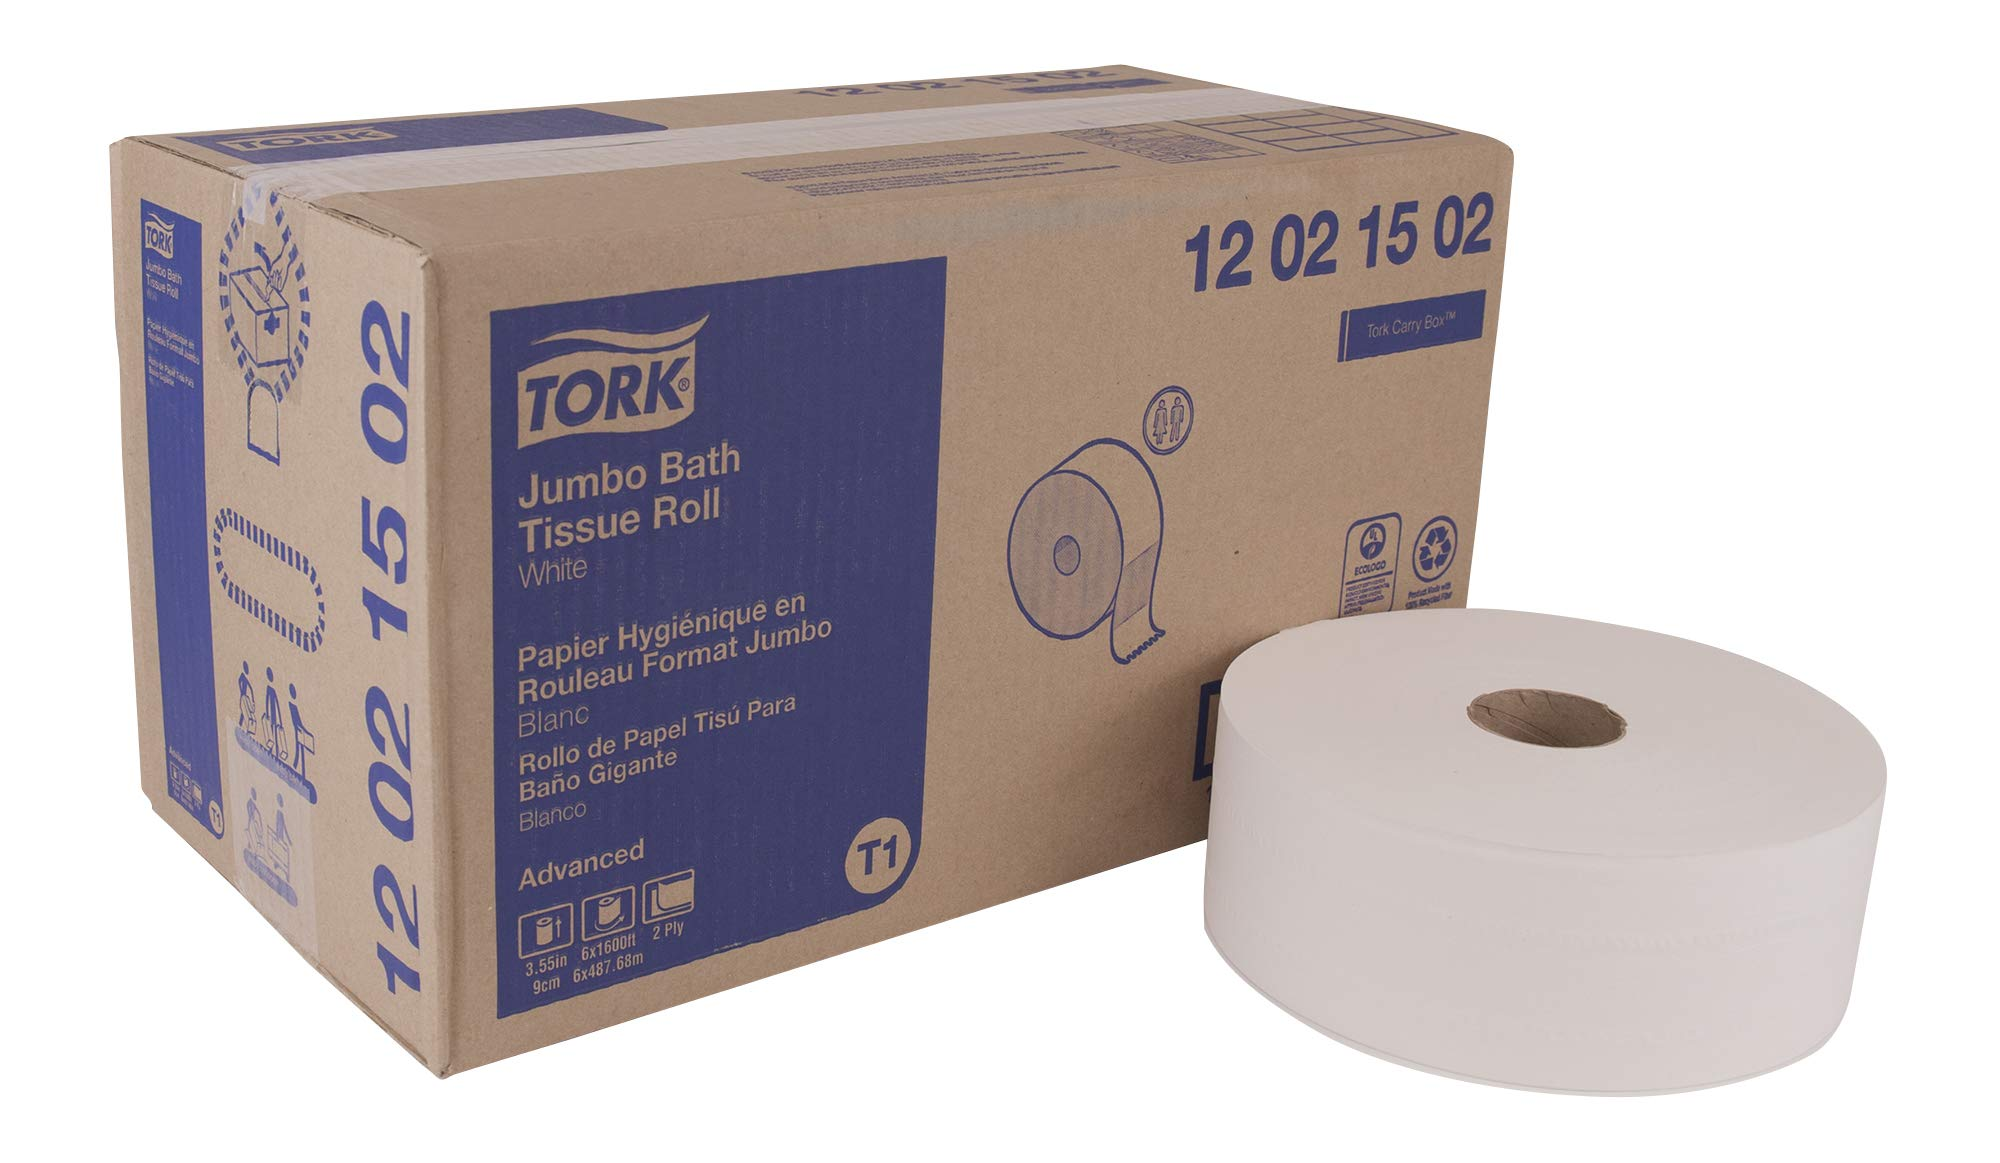 Tork Advanced 12021502 Jumbo Bath Tissue Roll, 2-Ply, 10'' Diameter, 3.55'' Width x 1,600' Length, White (Case of 6 Rolls, 1,600' per Roll, 9,600 Feet) by Tork